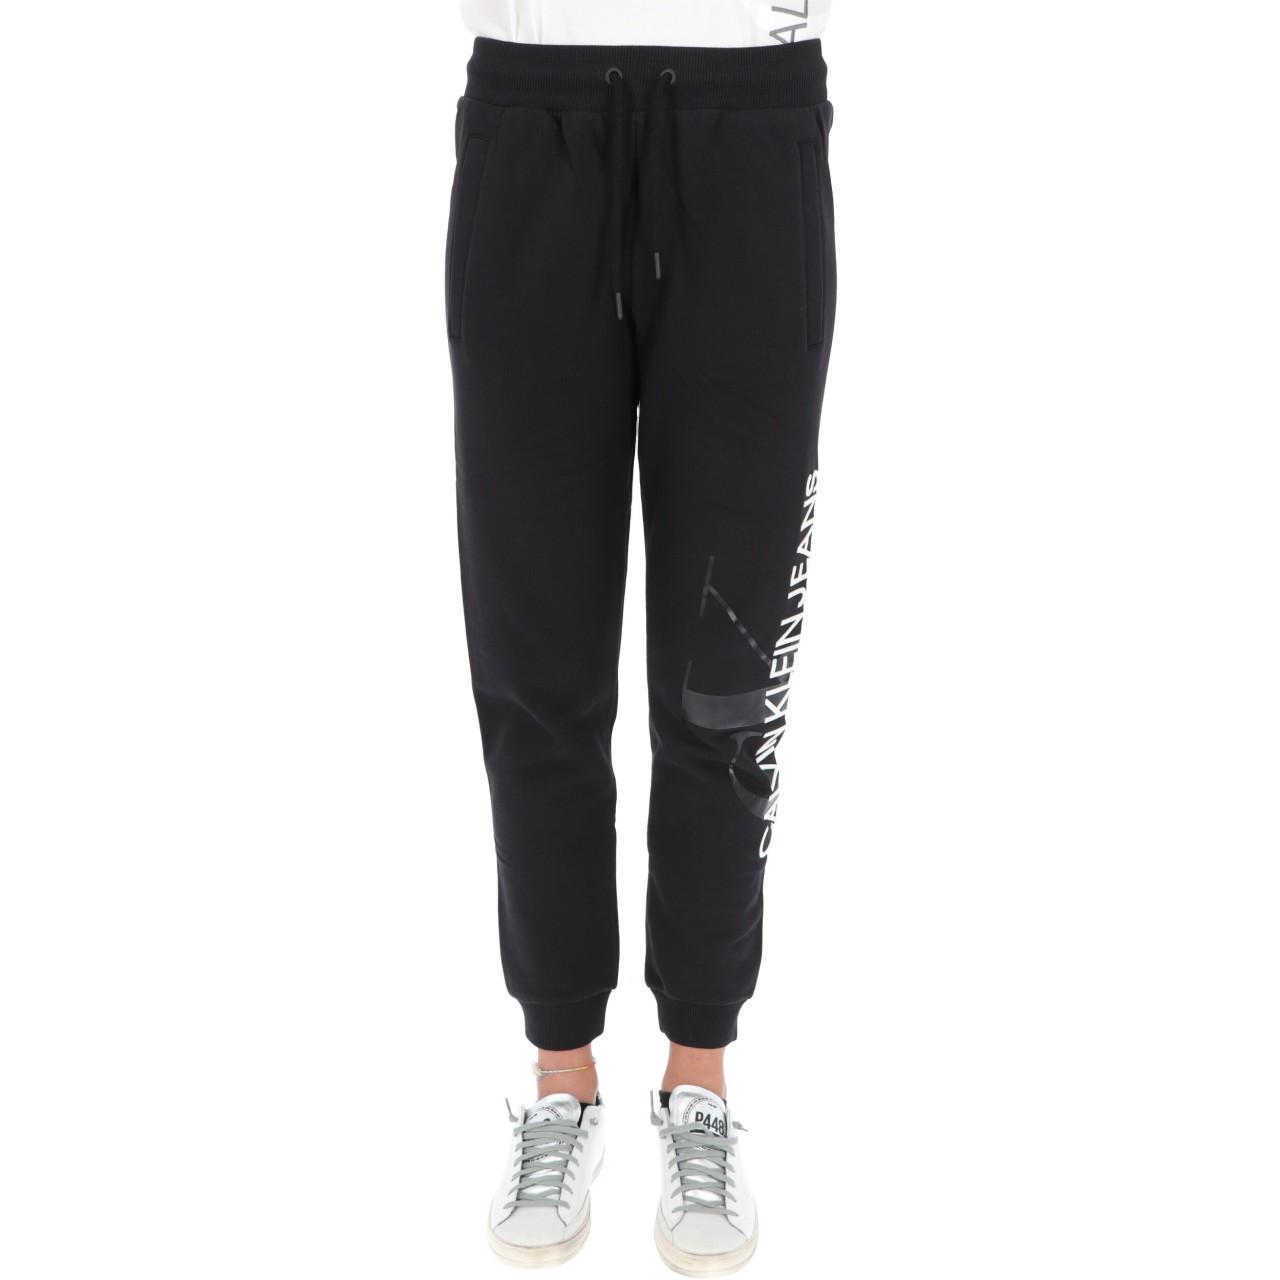 Calvin klein jeans Pantalone Calvin Klein Jeans Donna Vertical Moniogram 16582Q